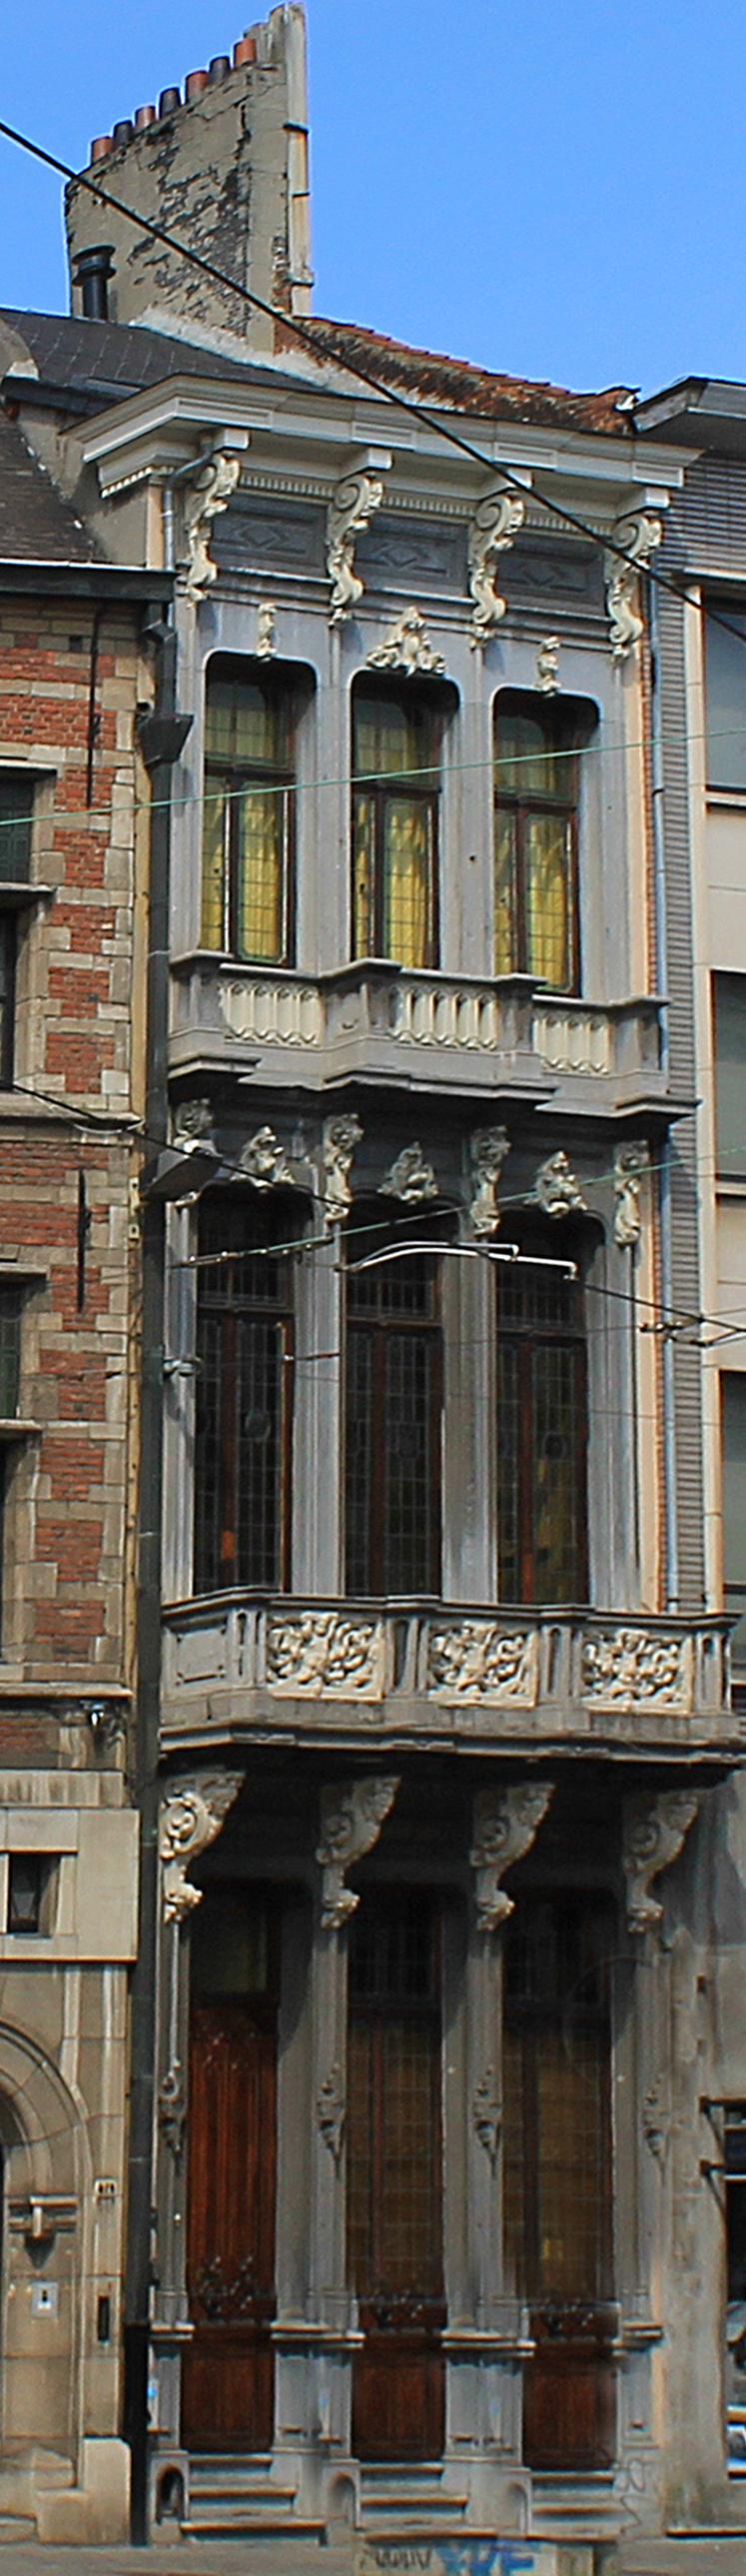 Bestand burgerhuis in louis philippe stijl minderbroedersrui 72 wikipedia - Ruimte stijl louis philippe ...